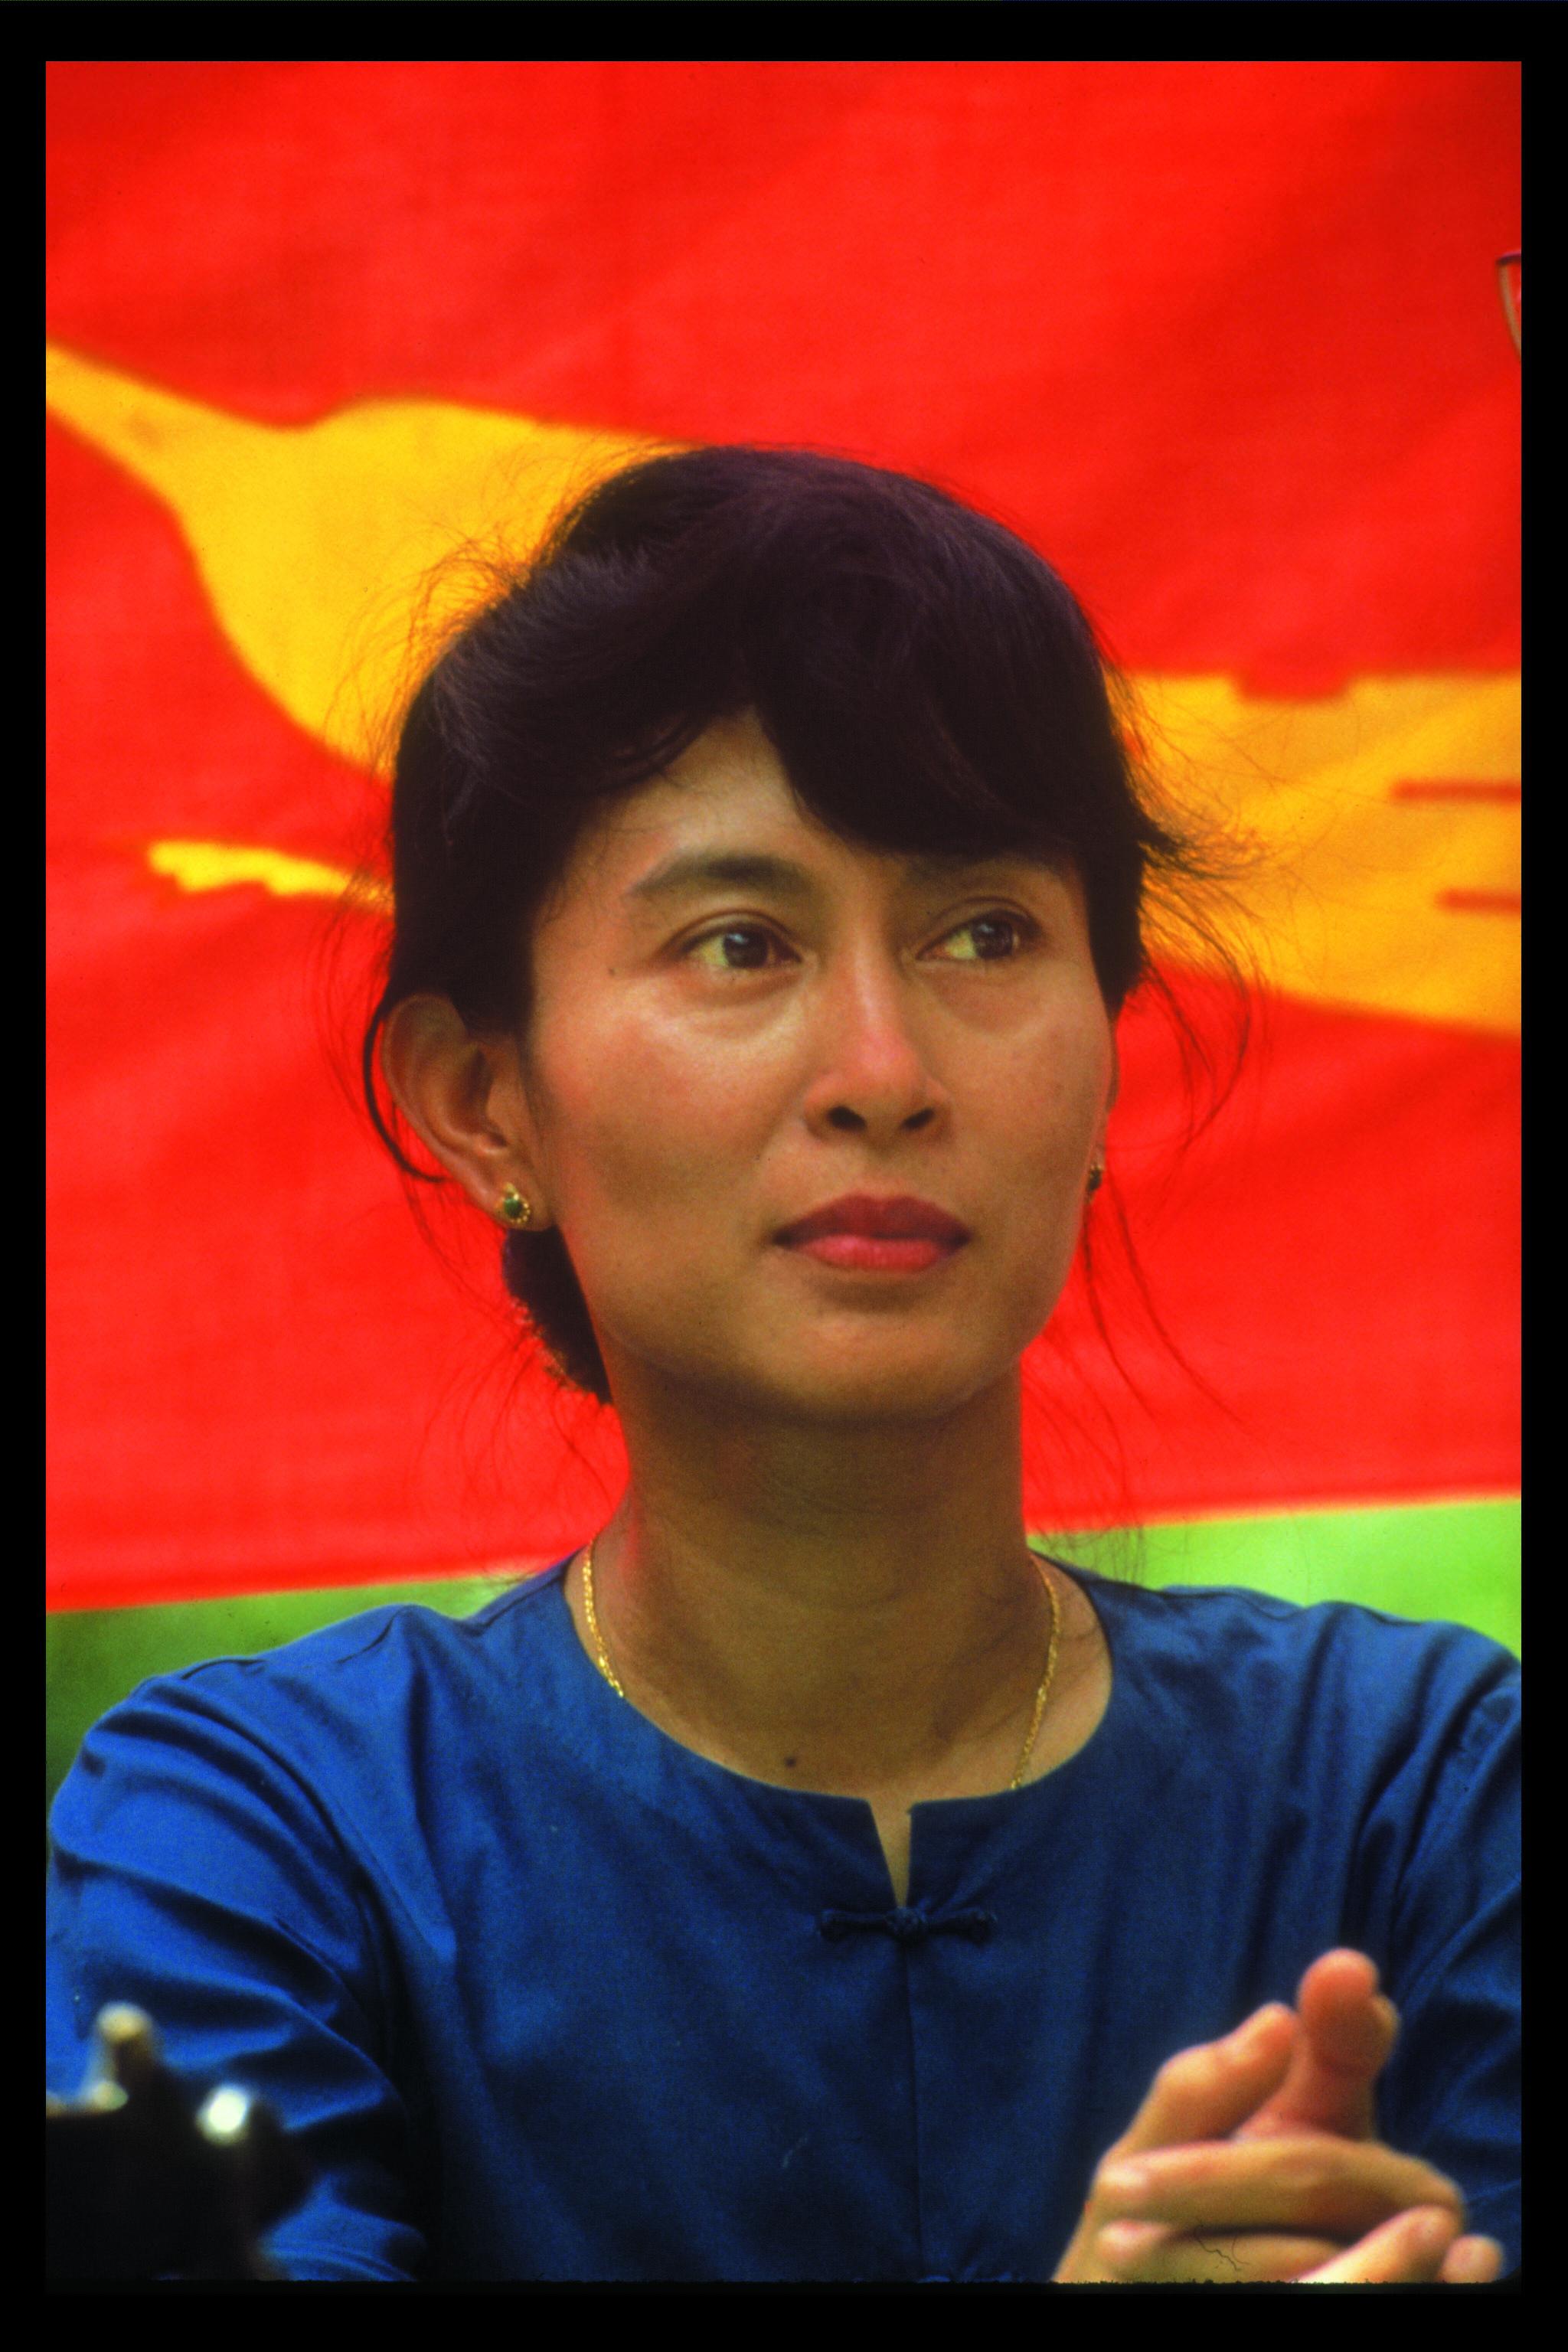 aung san suu kyi burma campaign uk